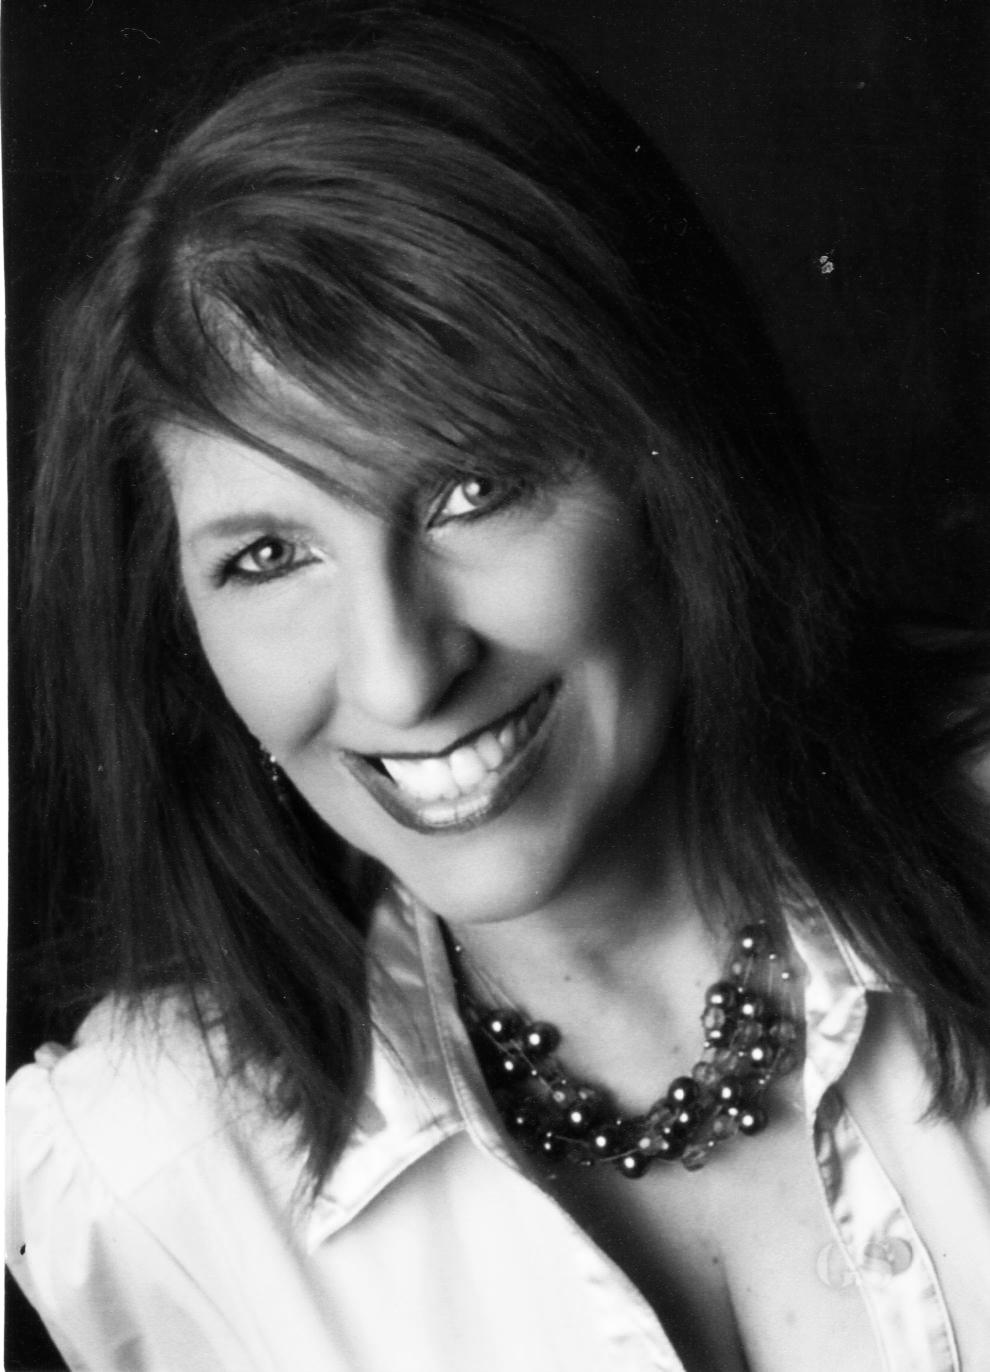 NAME : Stephanie Harris LOCATION : El Segundo, California SERVICES :∆ Tarot Card Intuitive Readings ∆ Spirit Medium Sittings ∆ Akashic Records Consultations ∆ Past Life Completion Process